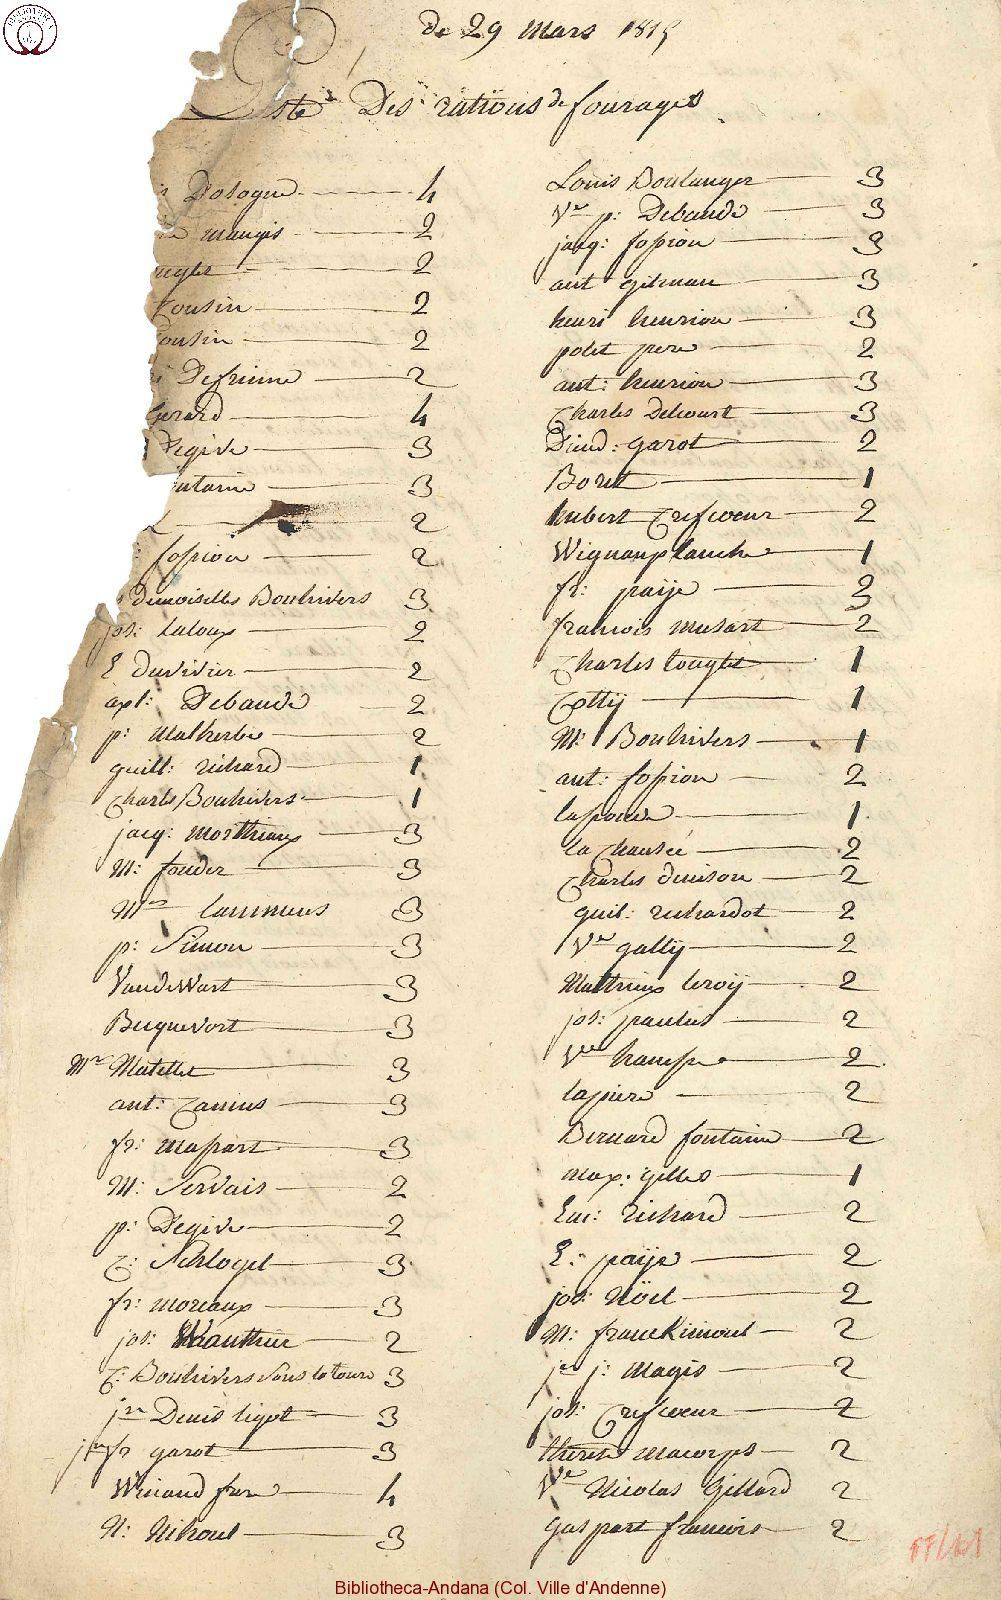 1815-03-29